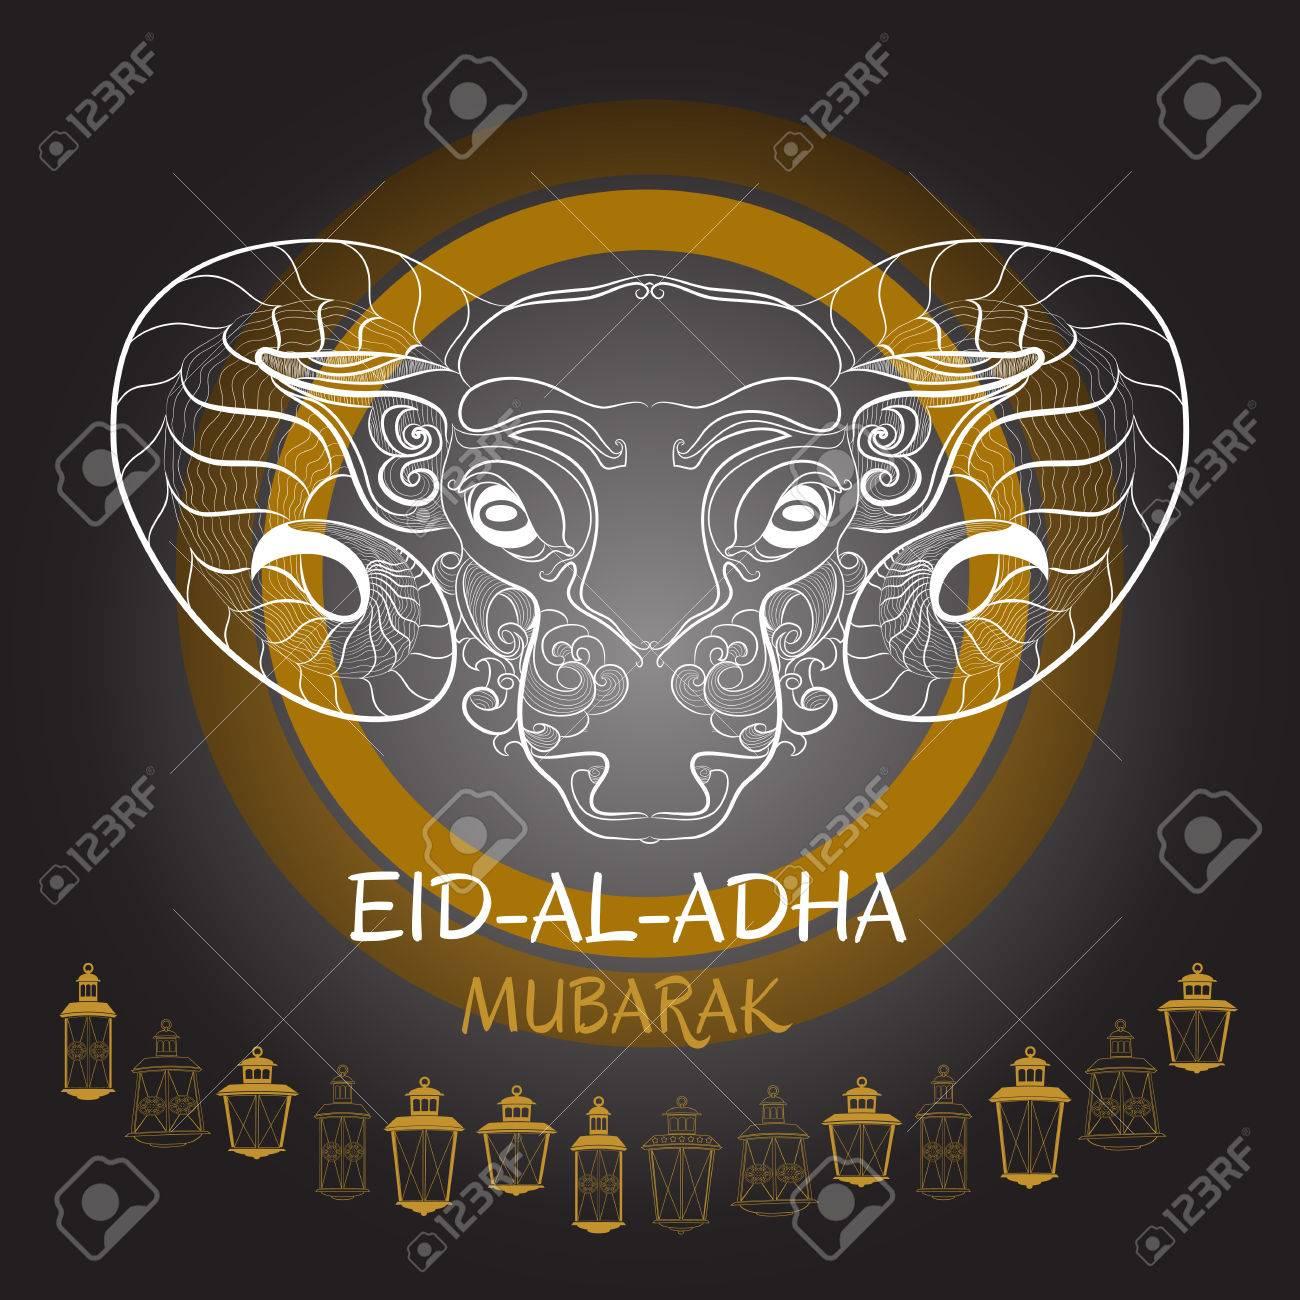 Eid Al Adha Mubarak Vector Illustration Of Sheep And Lantern